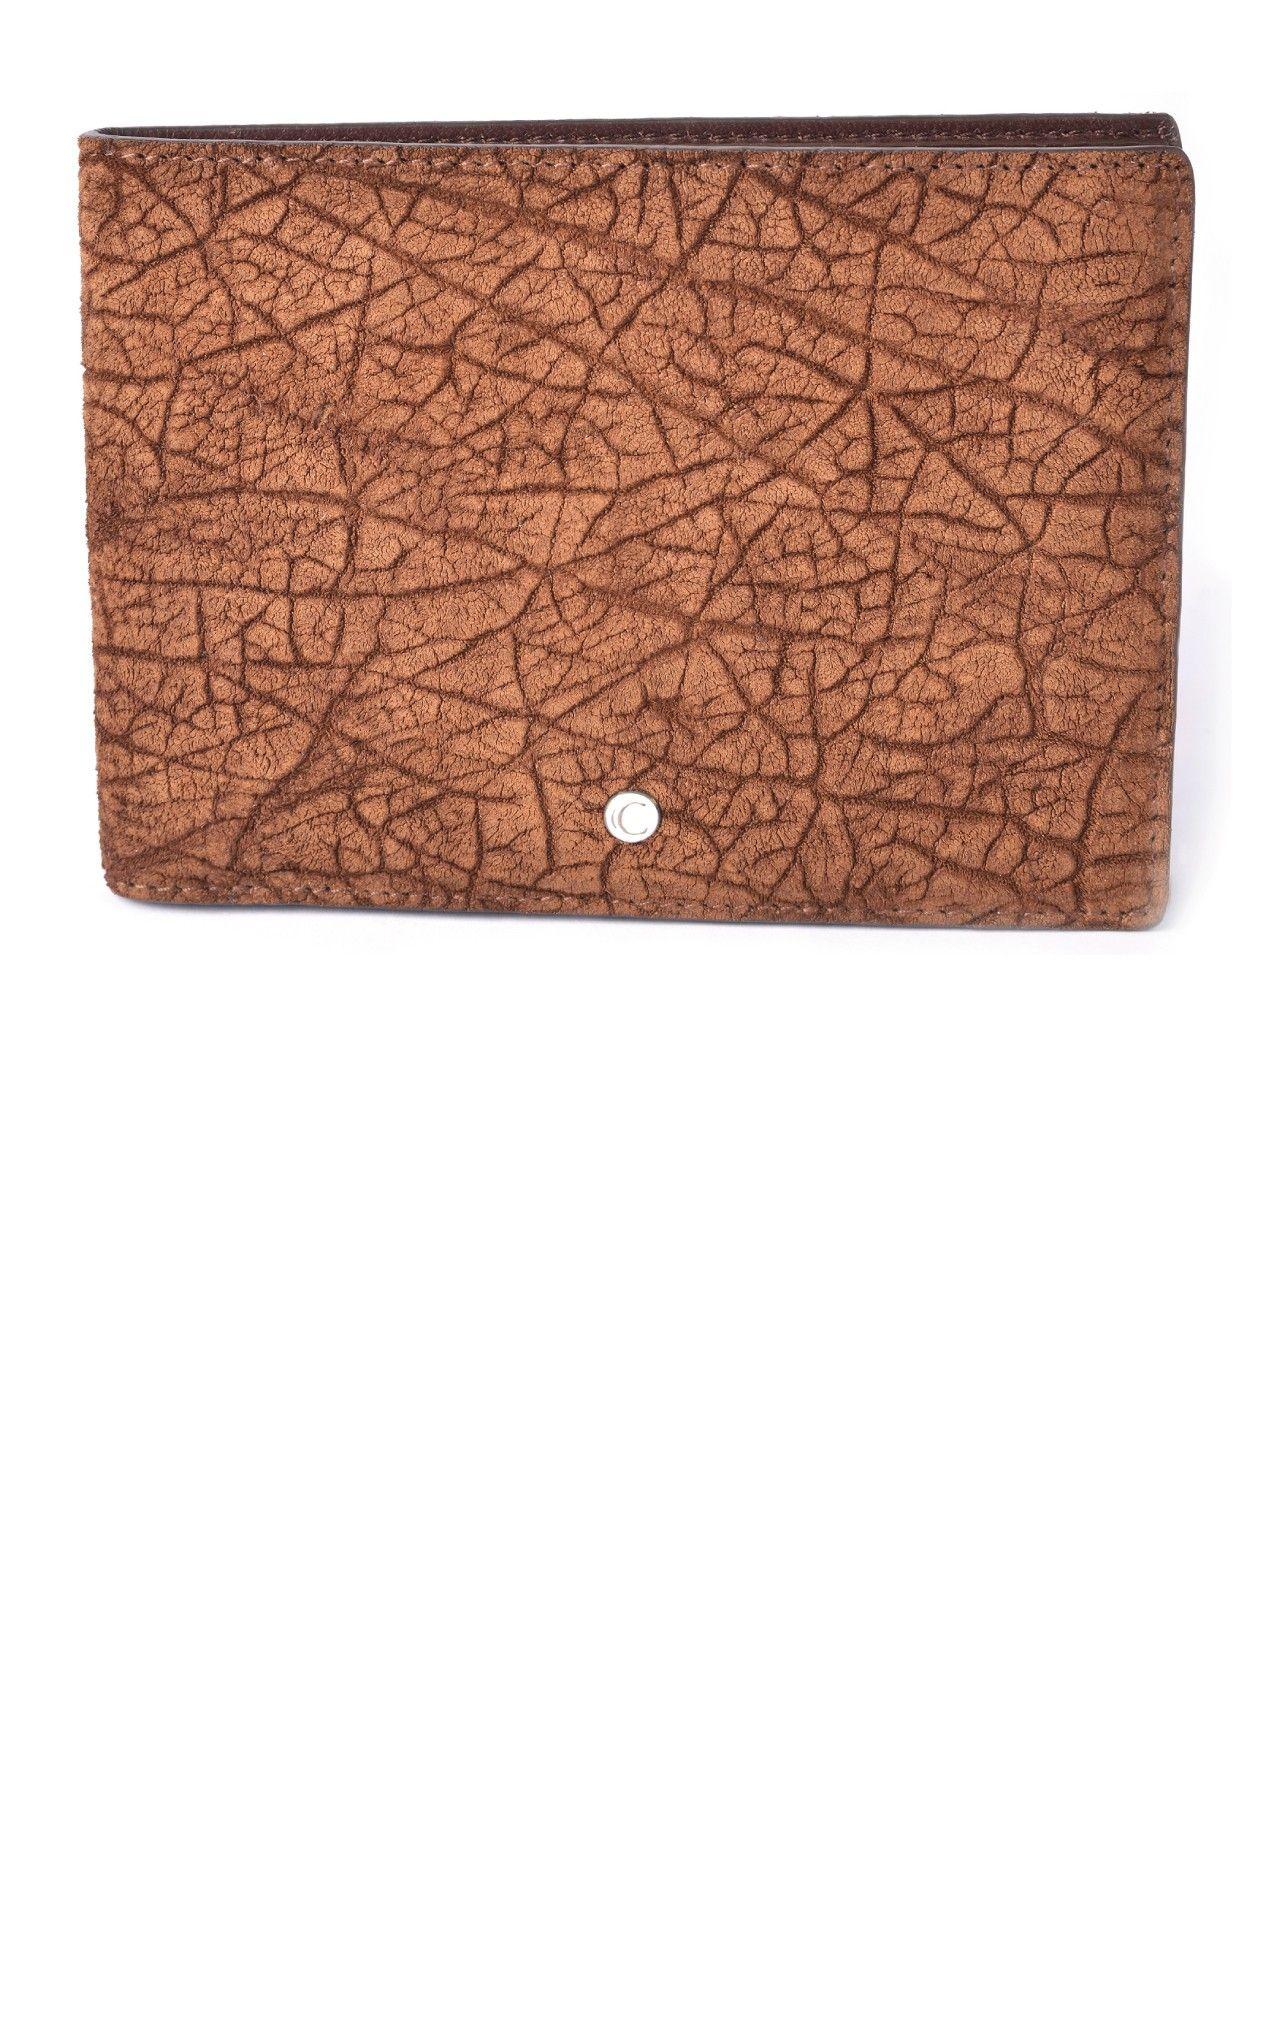 Genuine Python SnakeSkin Exotic Leather Men/'s Bifold Wallet Coin Pocket Black